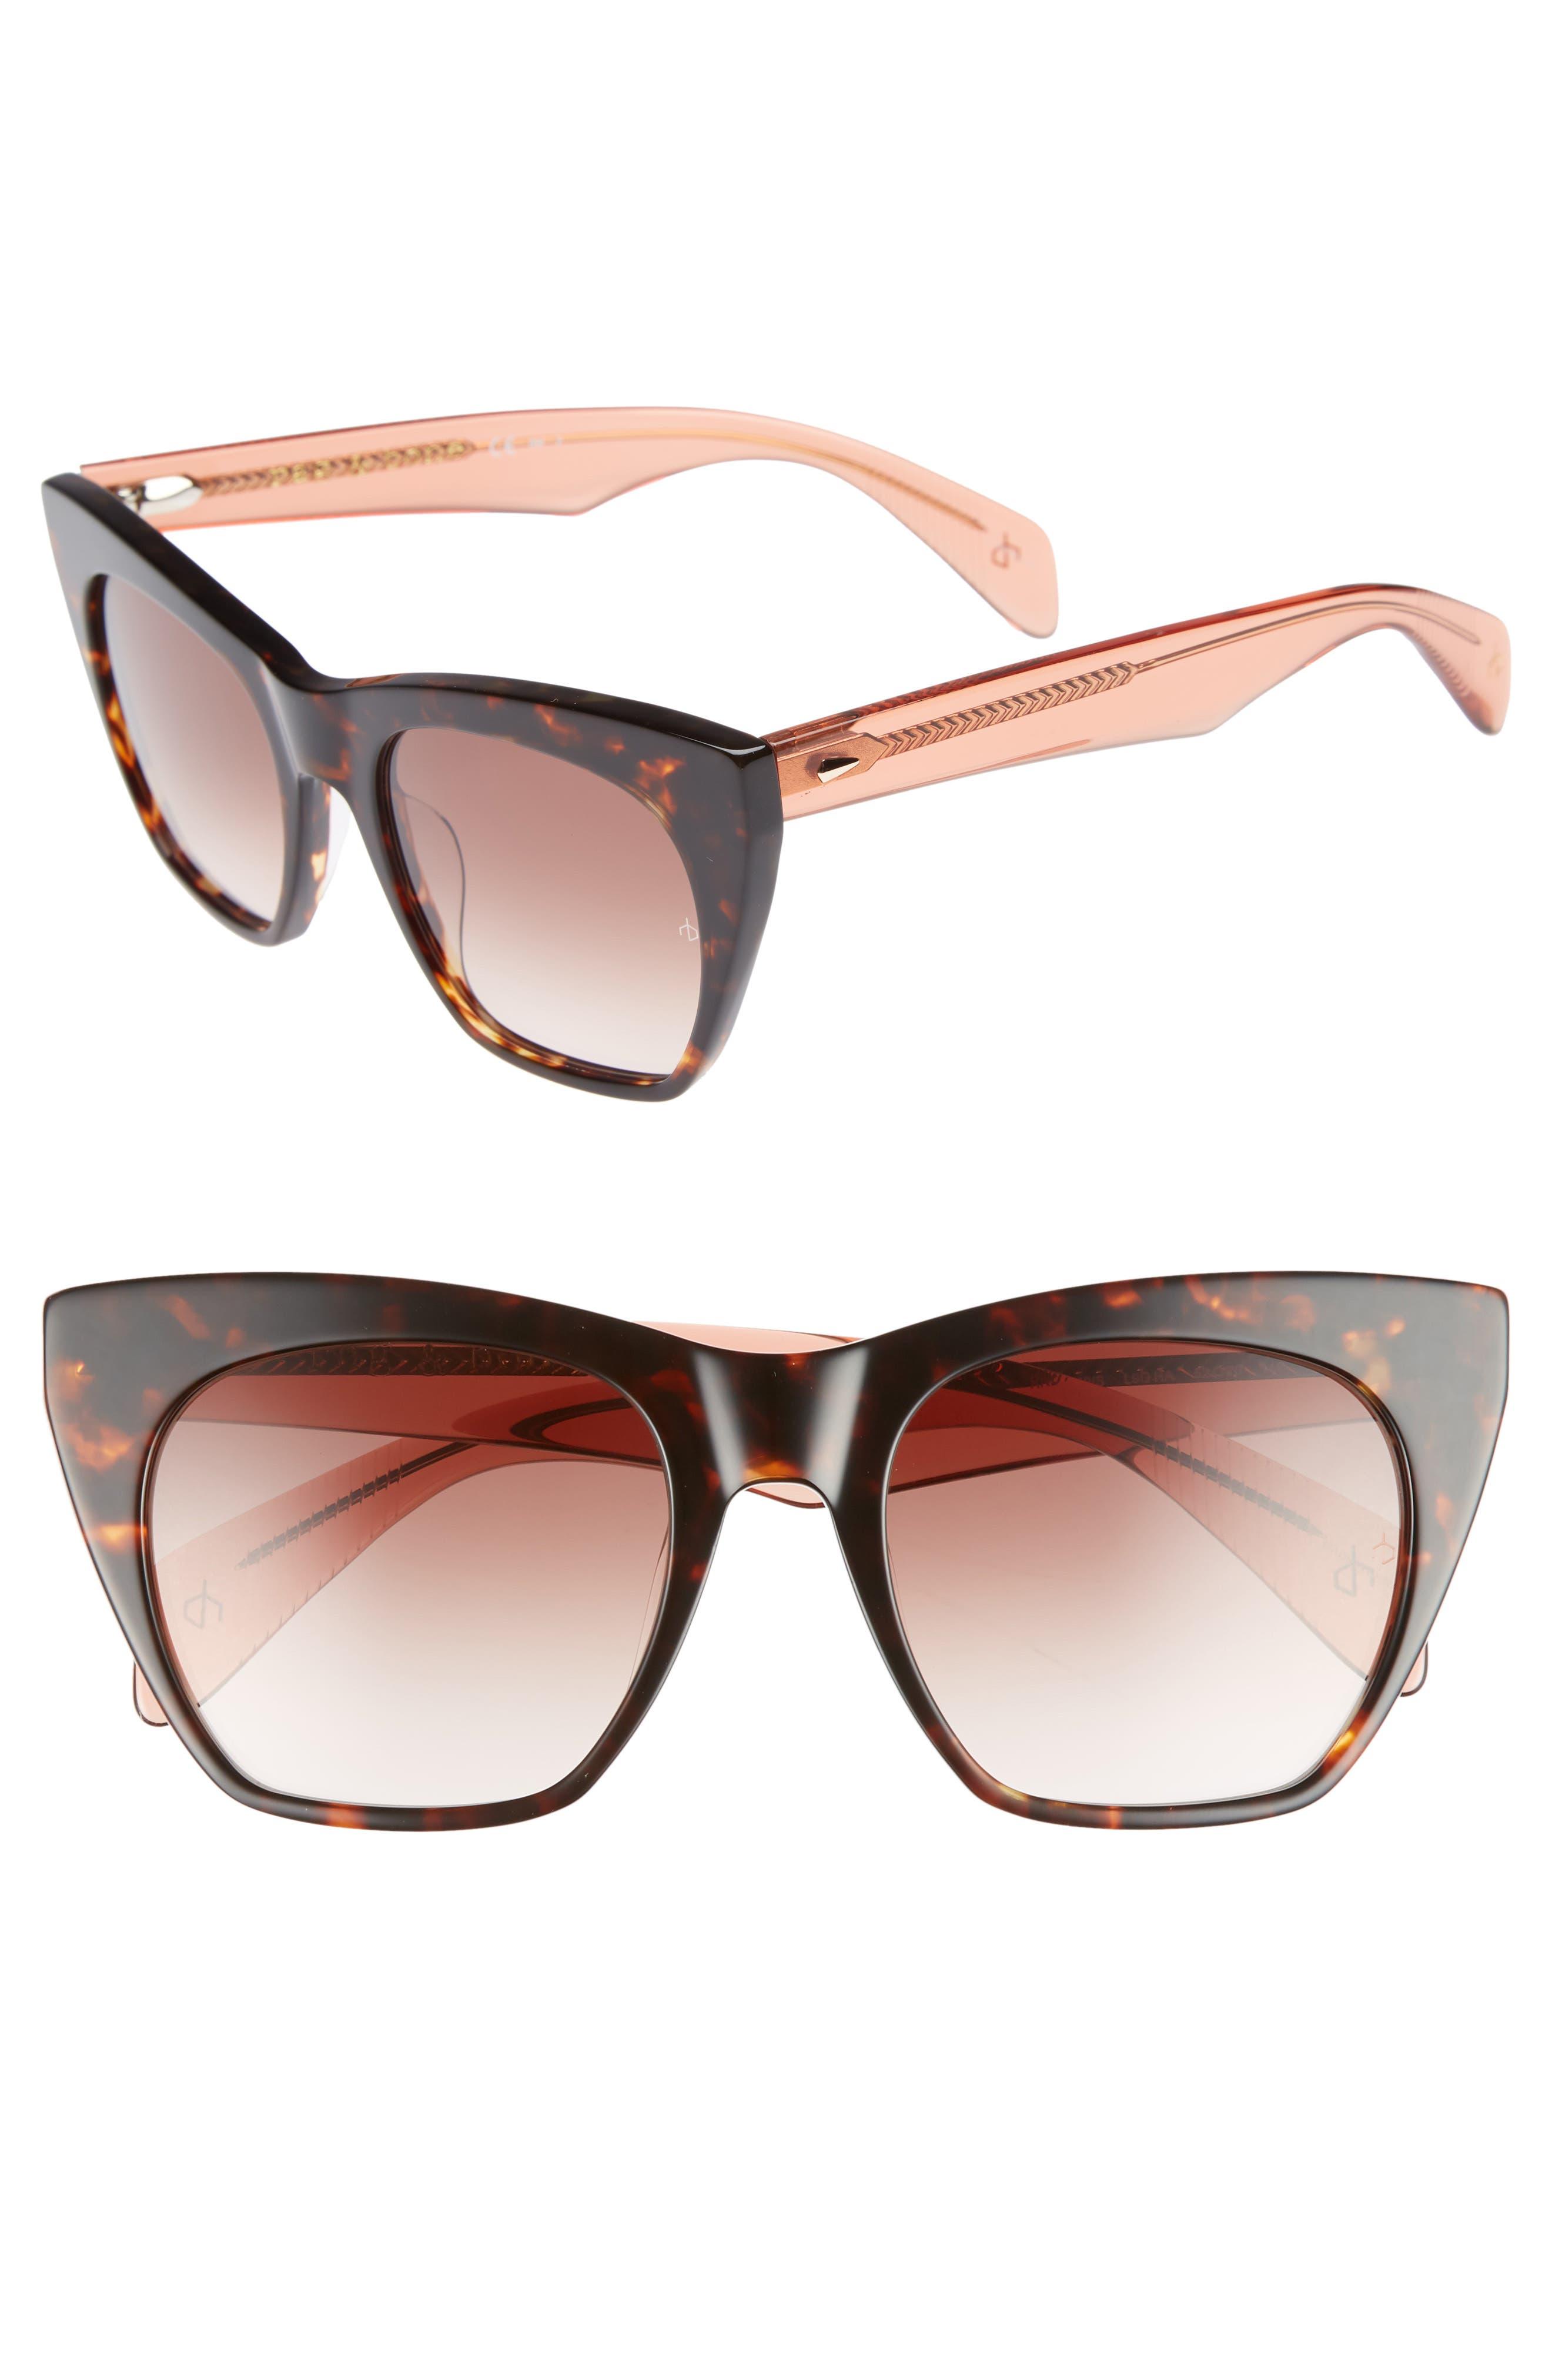 52mm Cat Eye Sunglasses,                             Main thumbnail 1, color,                             Havana Orange